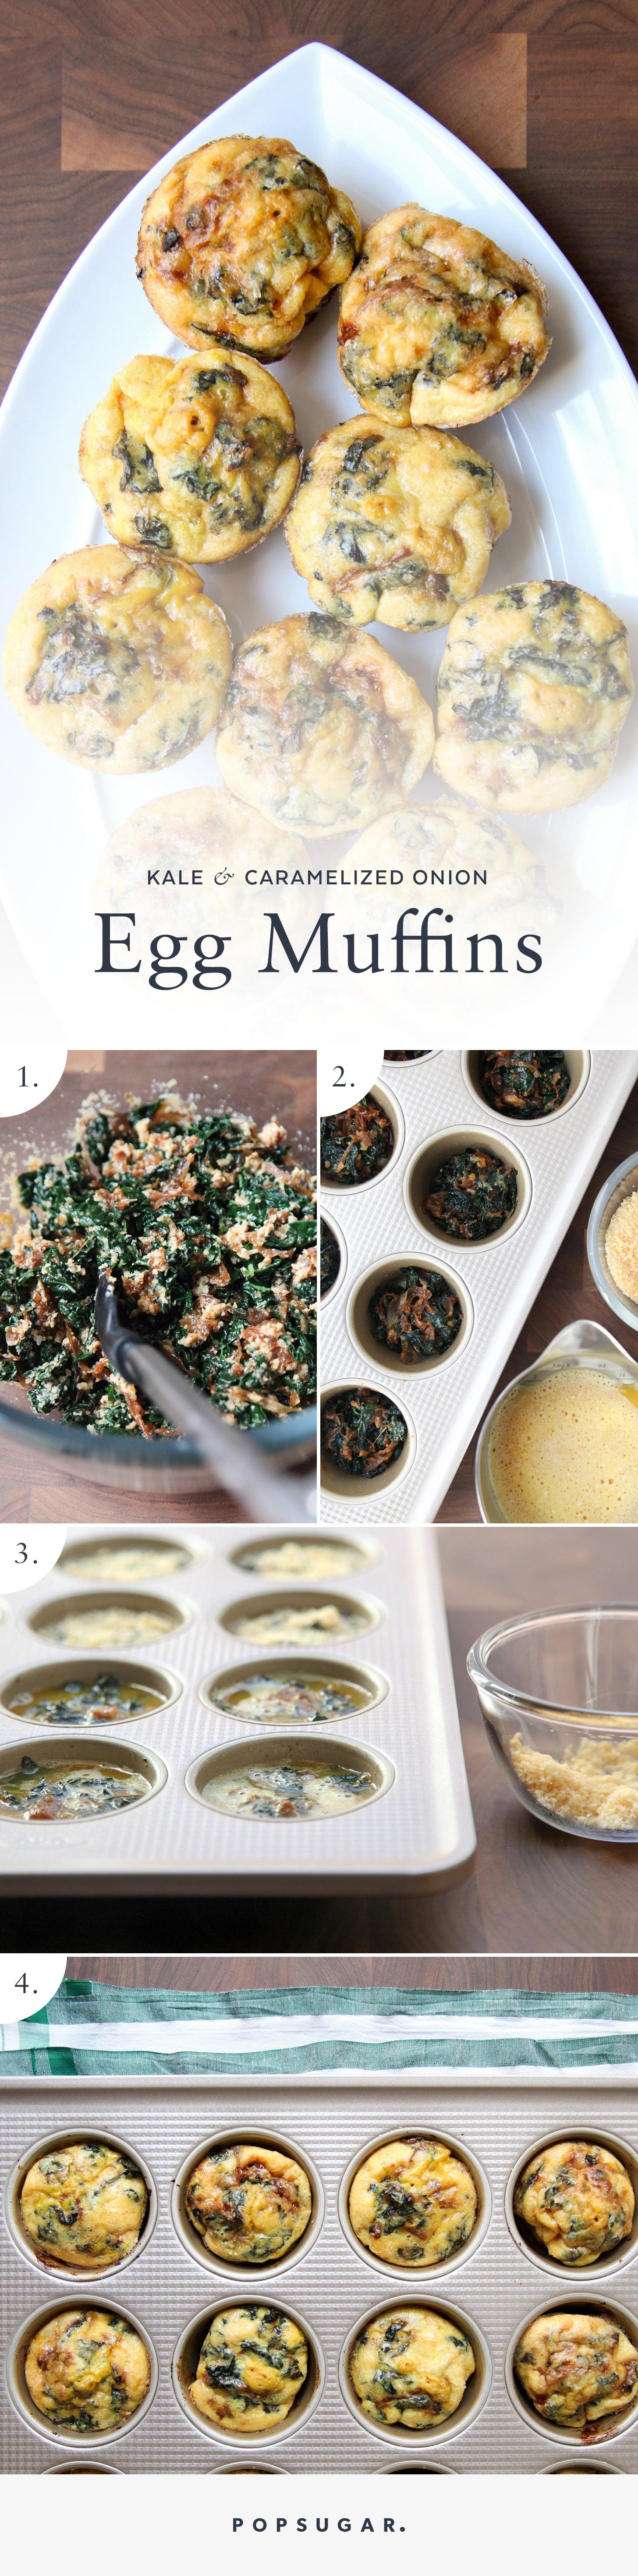 Grab-and-Go Egg Muffins Make Breakfast a Breeze